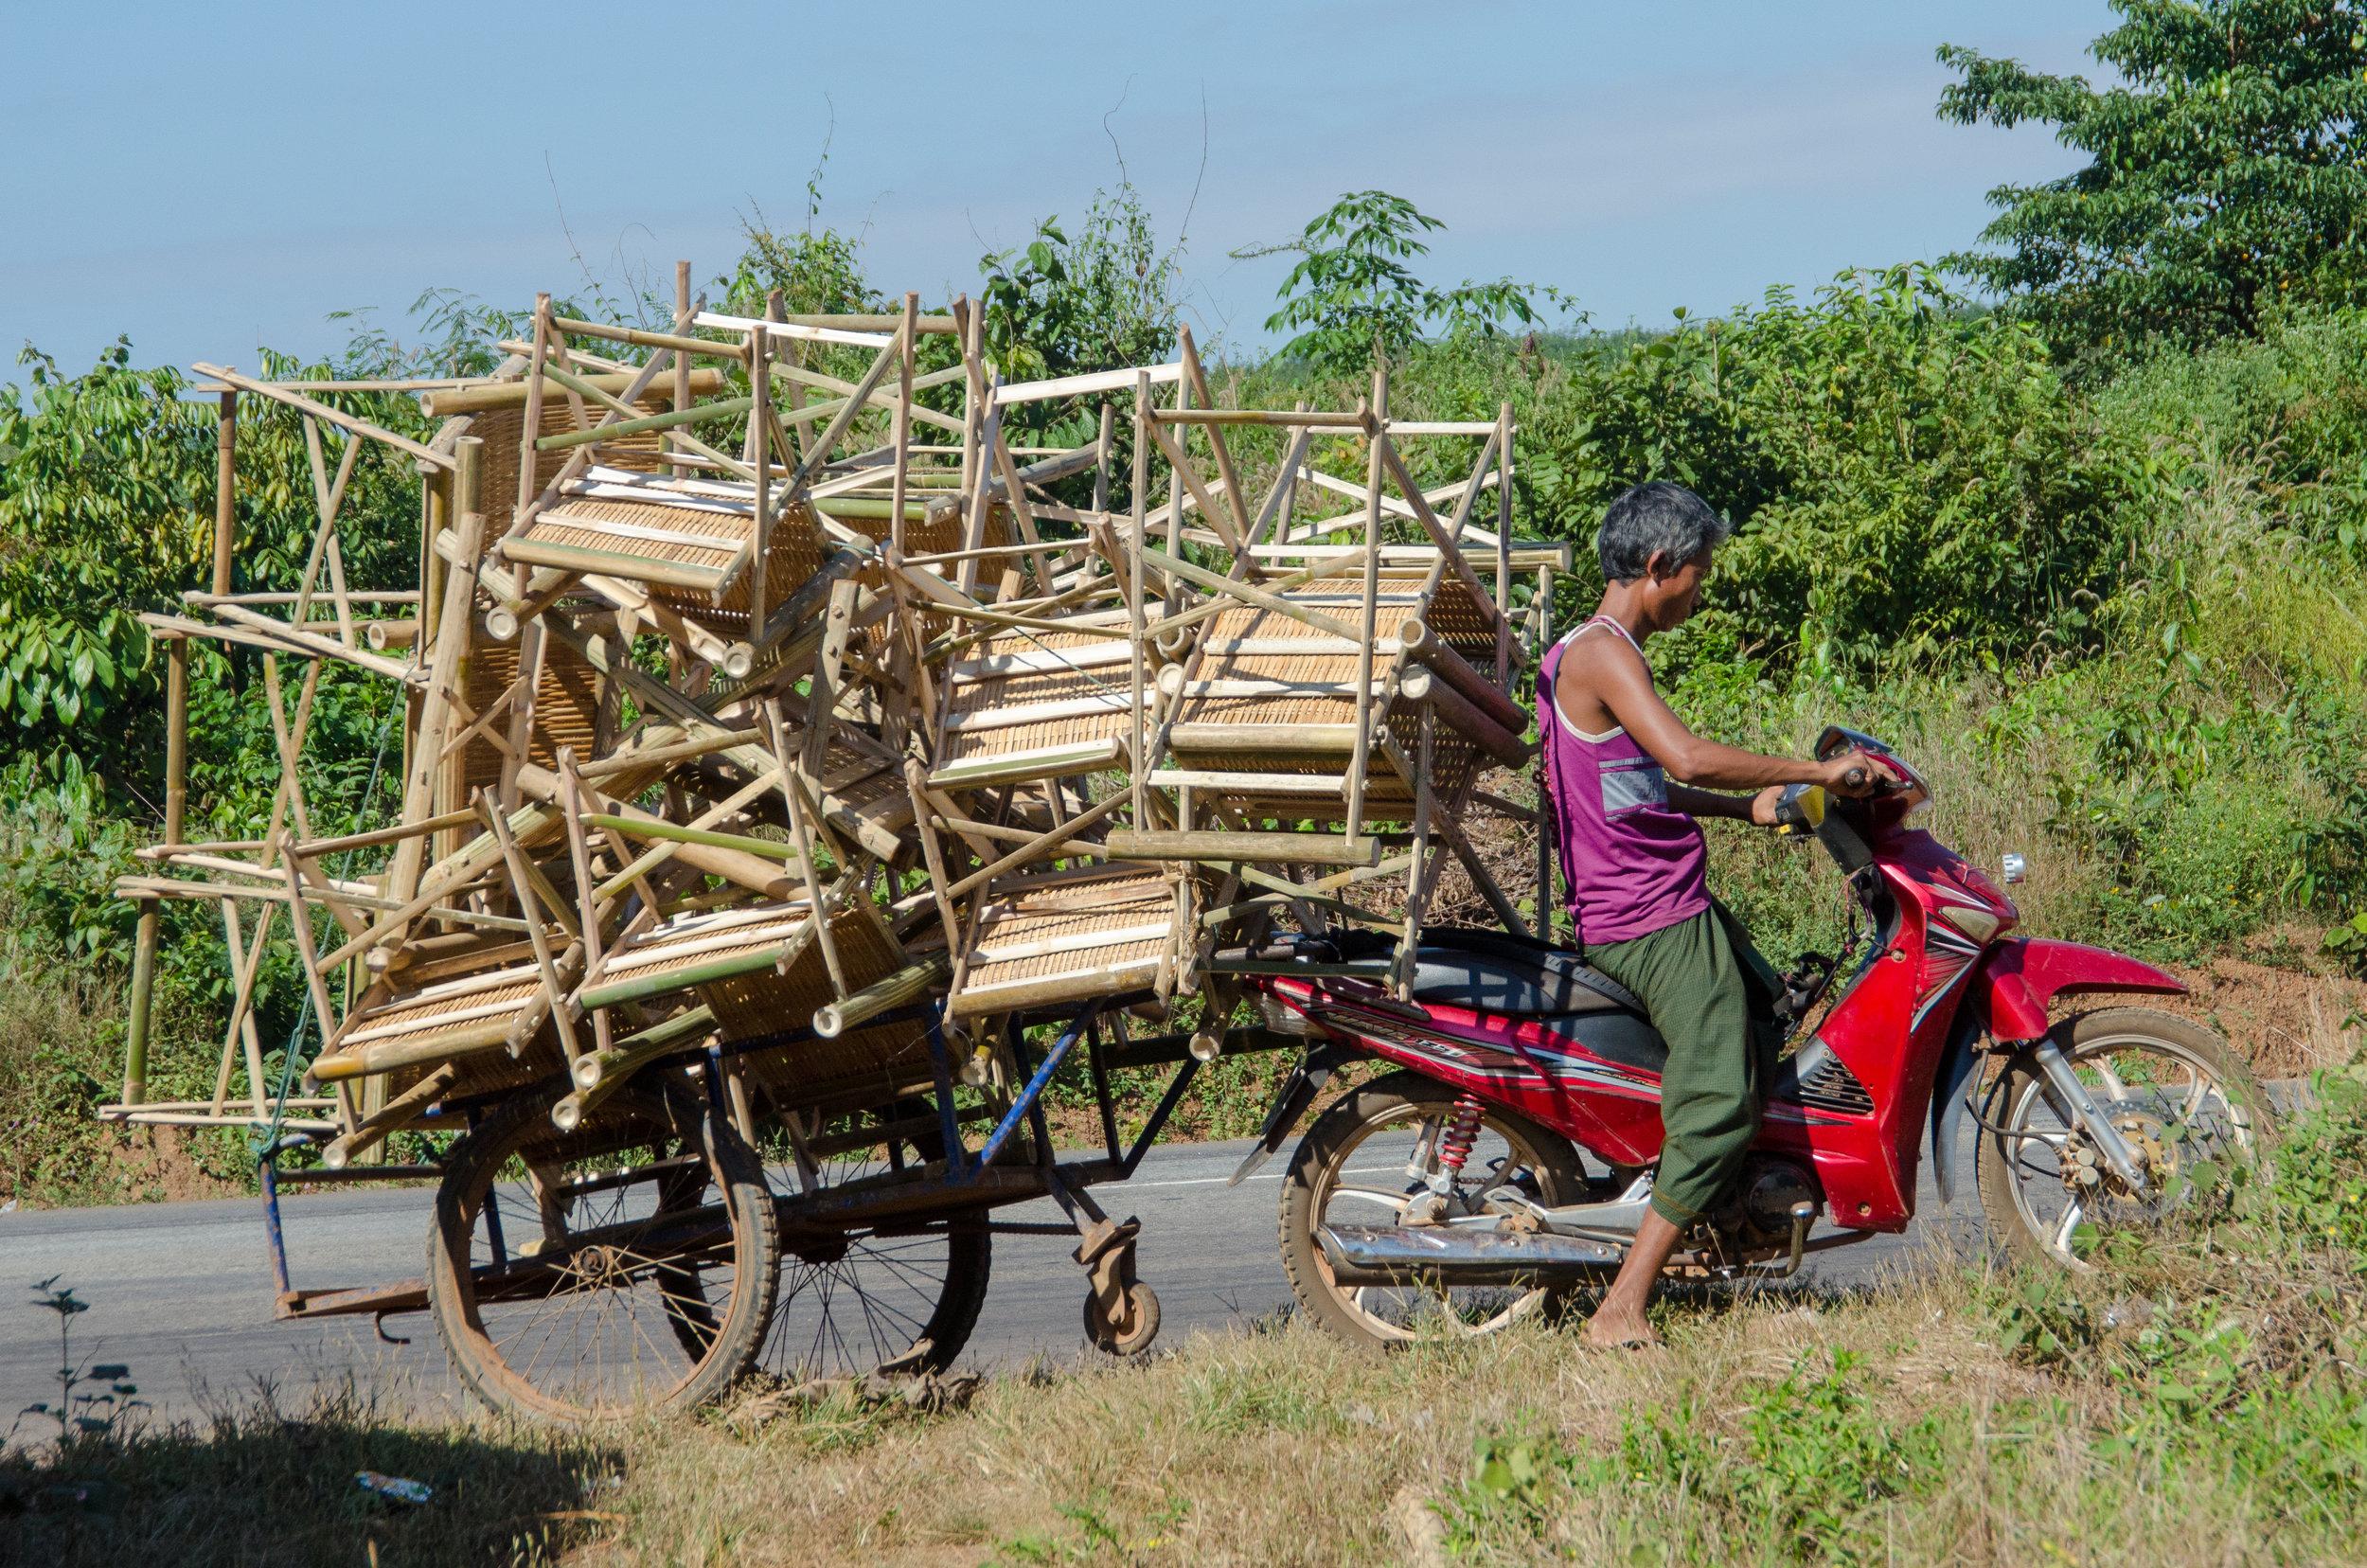 Transporting bamboo furniture, Moke, Kha Mu, Myanmar